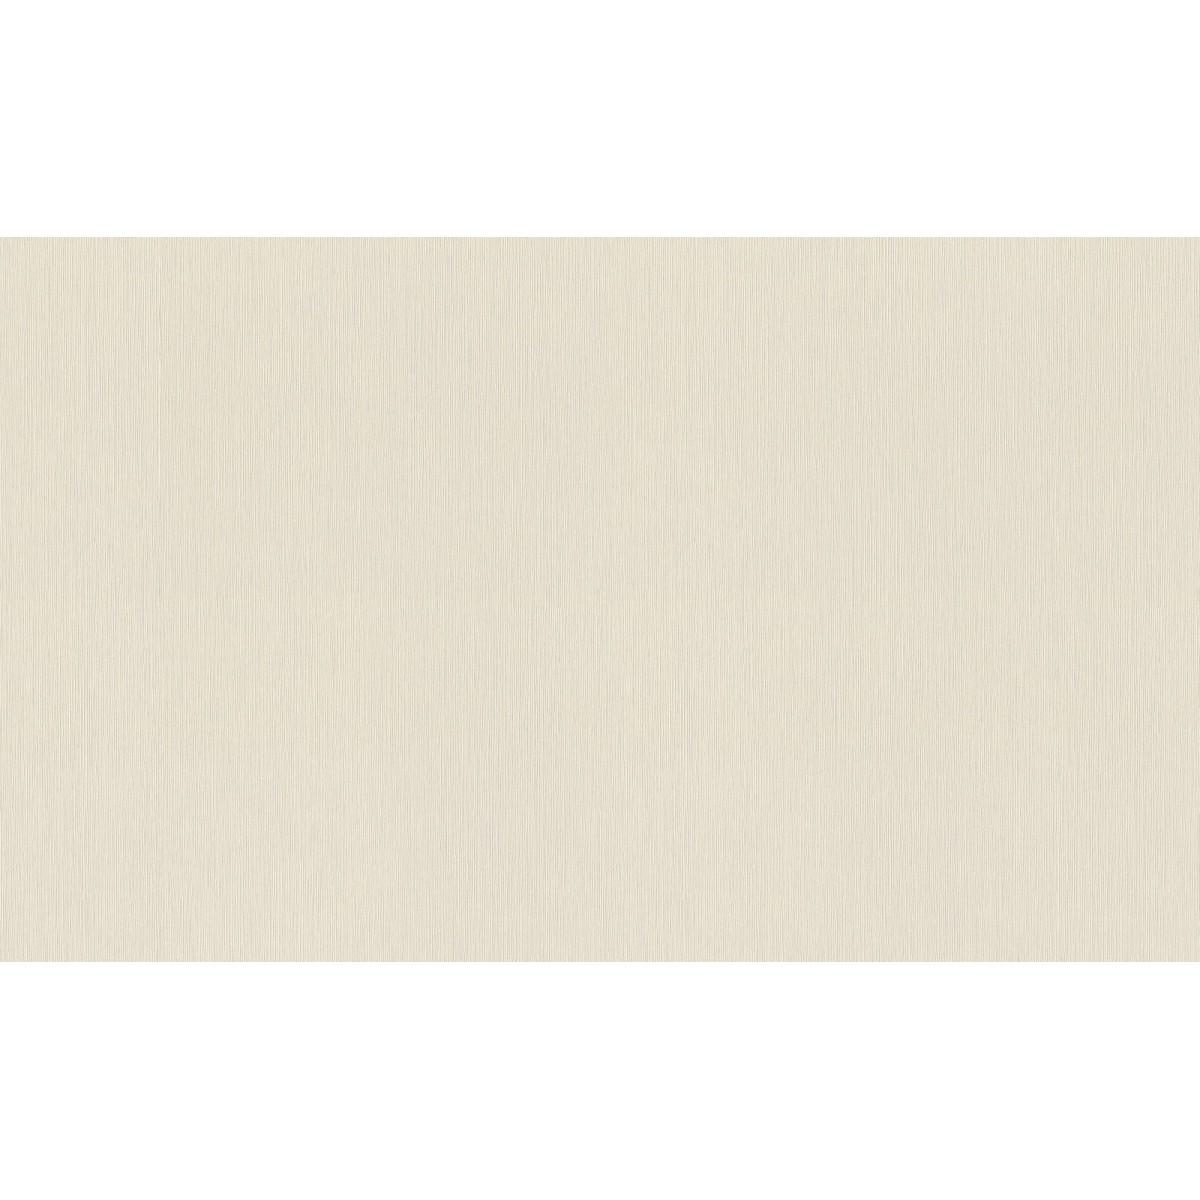 Обои флизелиновые Rasch Chatelaine III бежевые 968552 1.06 м